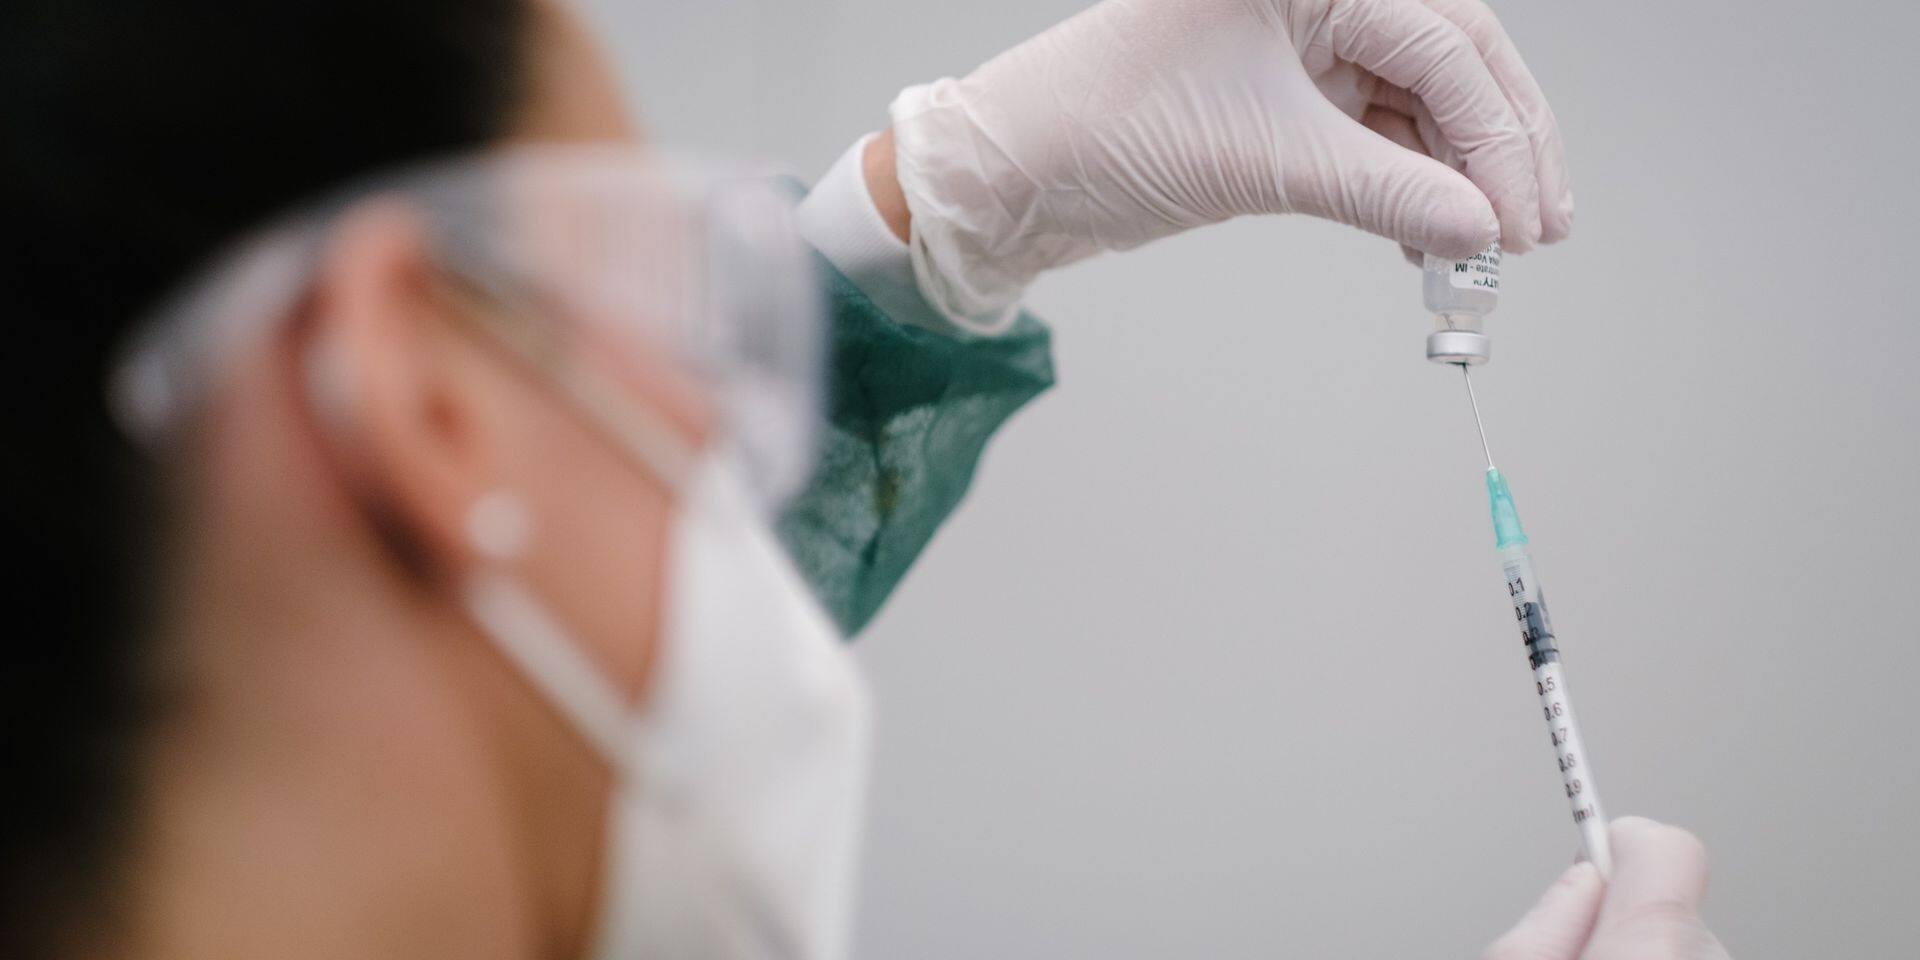 Quelque 200 millions de doses de vaccin anti-Covid administrées dans l'UE